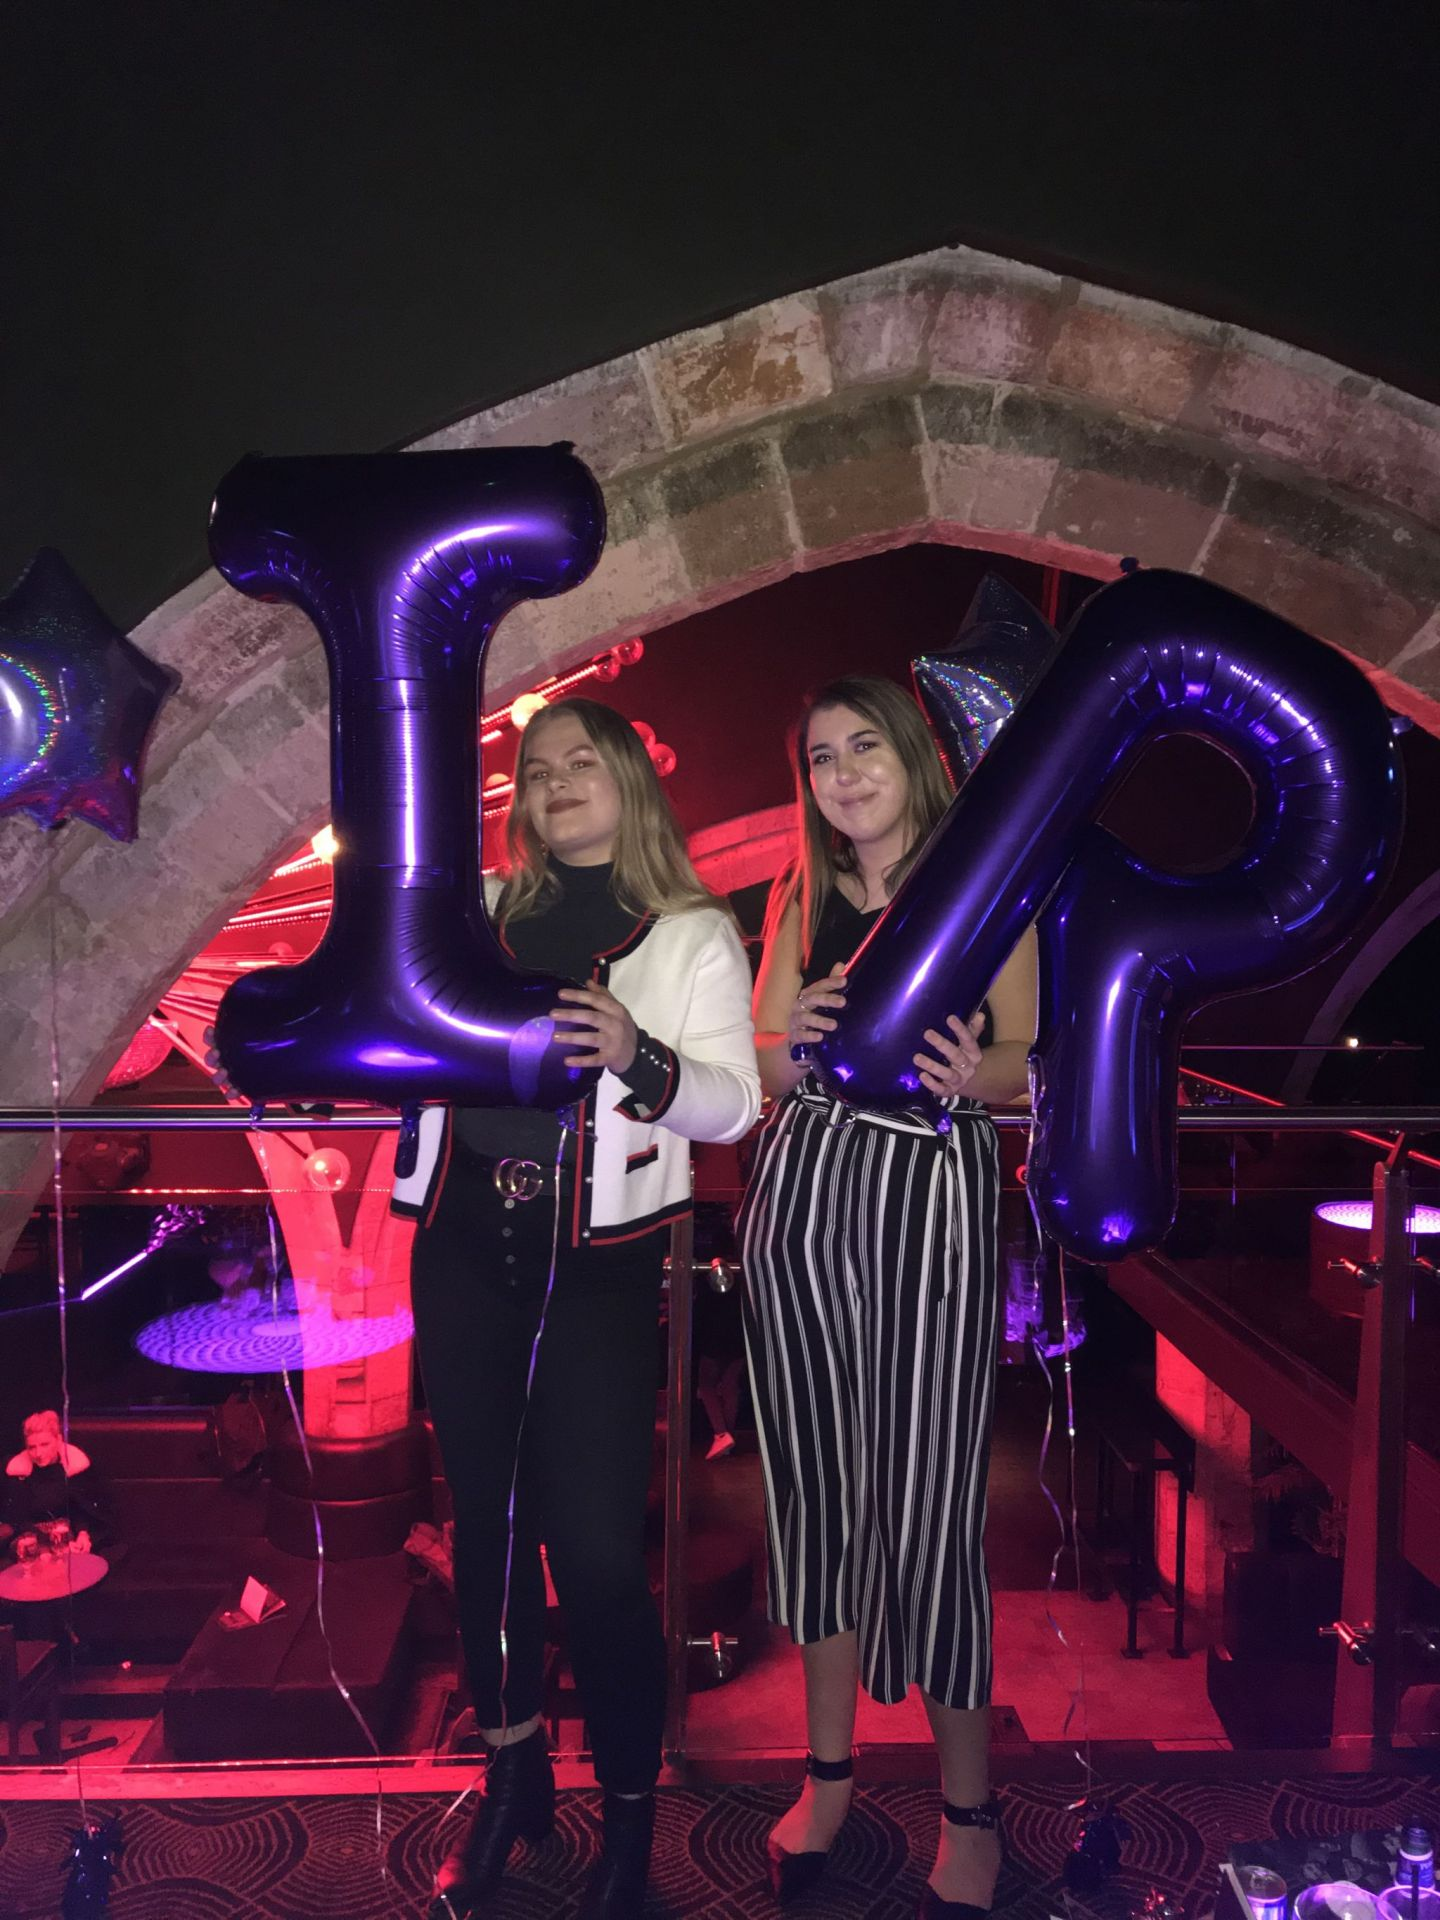 Abbi and I holding purple I&R balloons at Jalou York